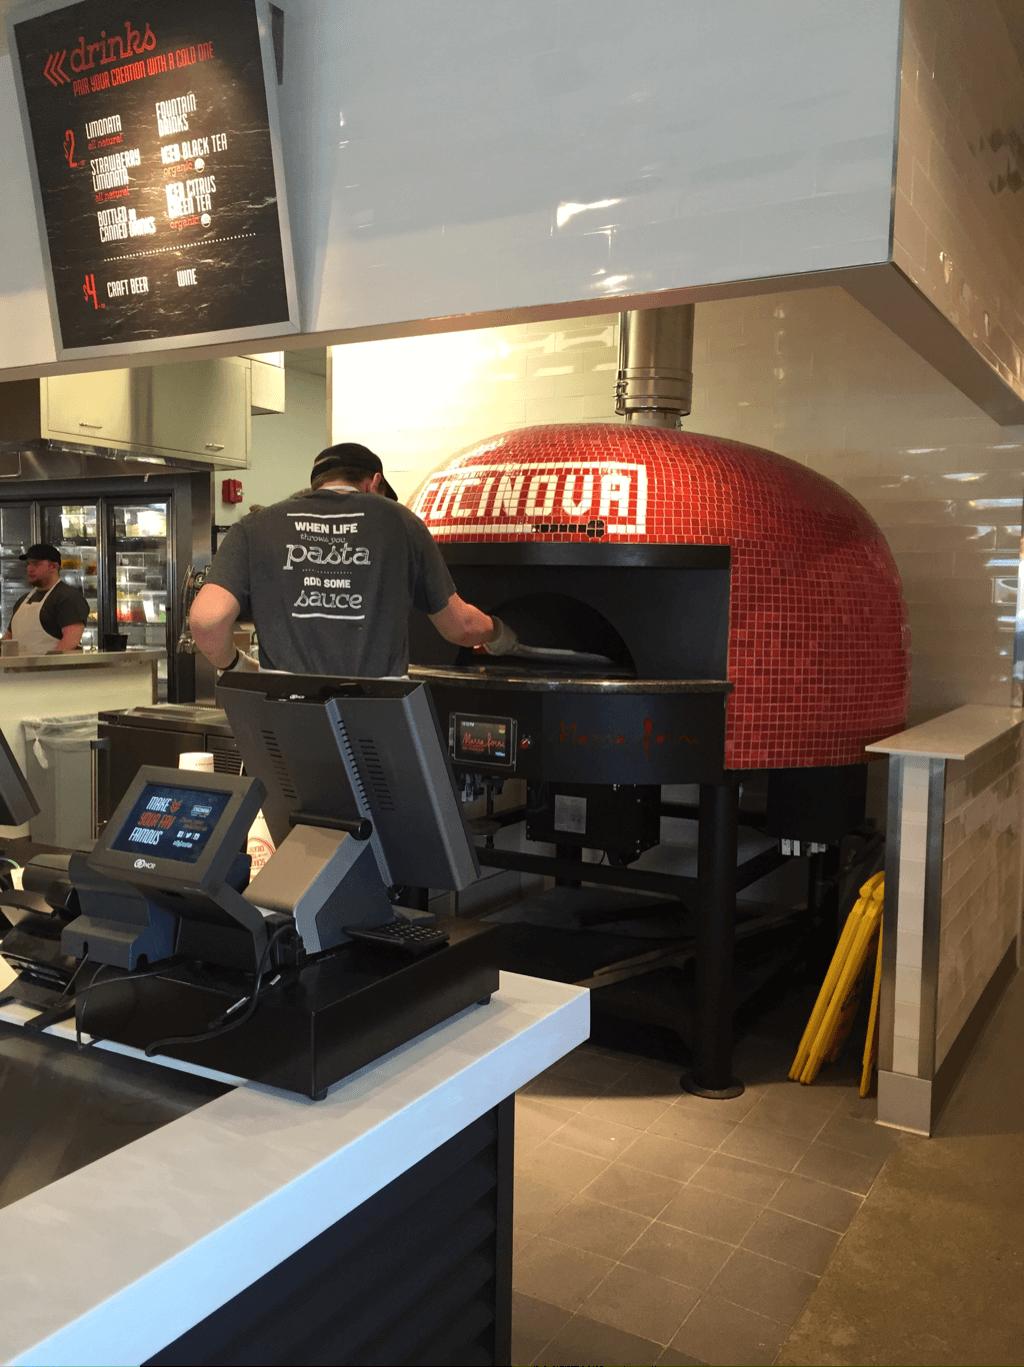 cucinova rotator rotator brick oven in operation